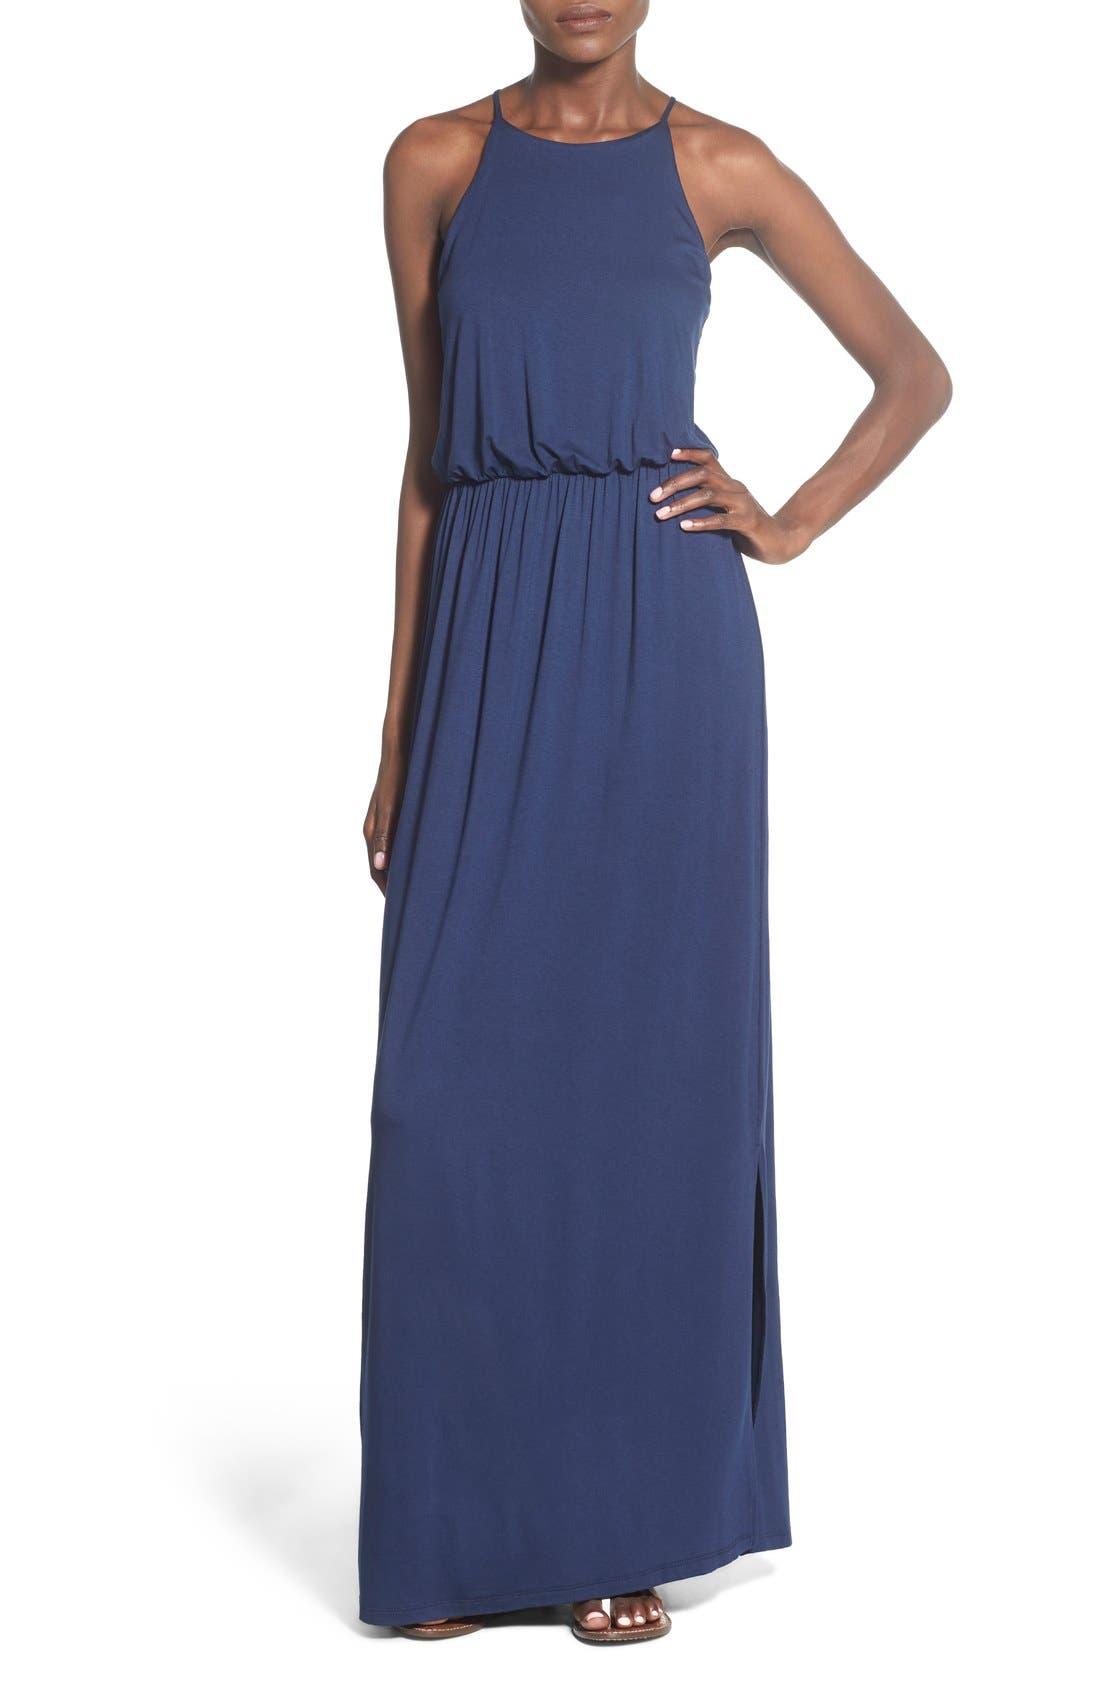 Main Image - Lush High Neck Maxi Dress